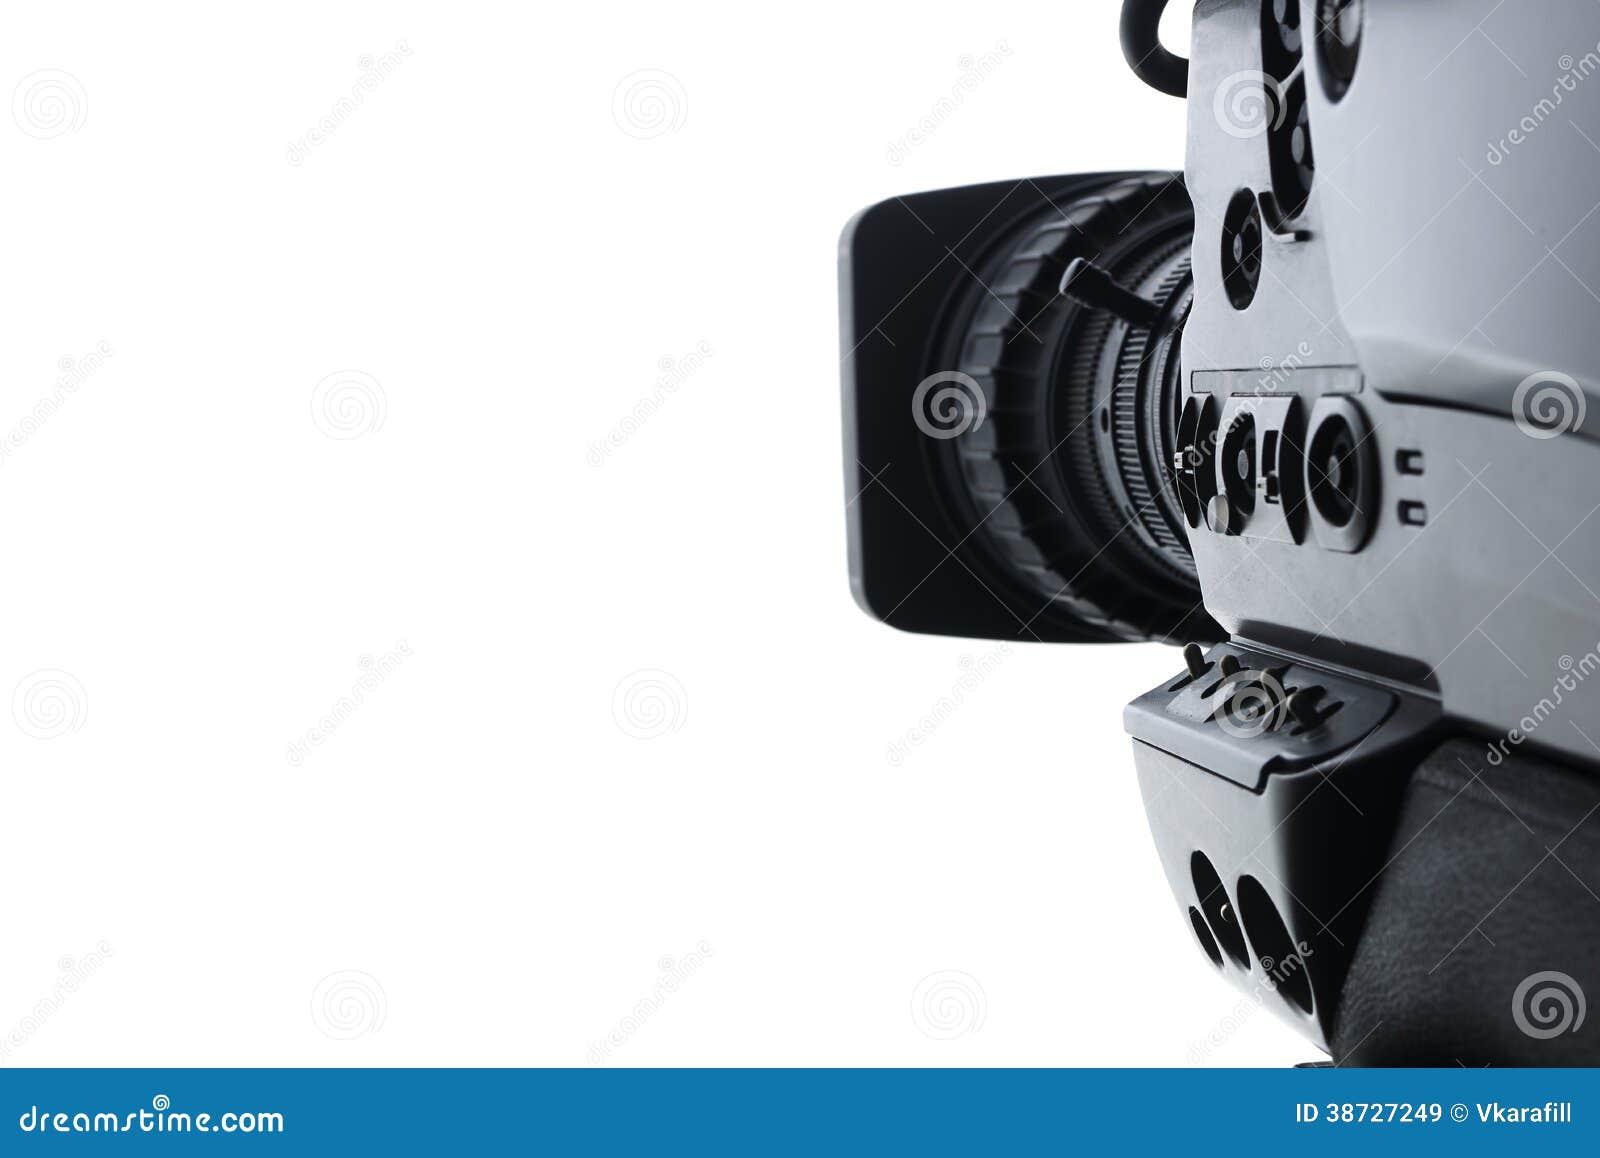 Professional Digital Video Camera Royalty Free Stock ...